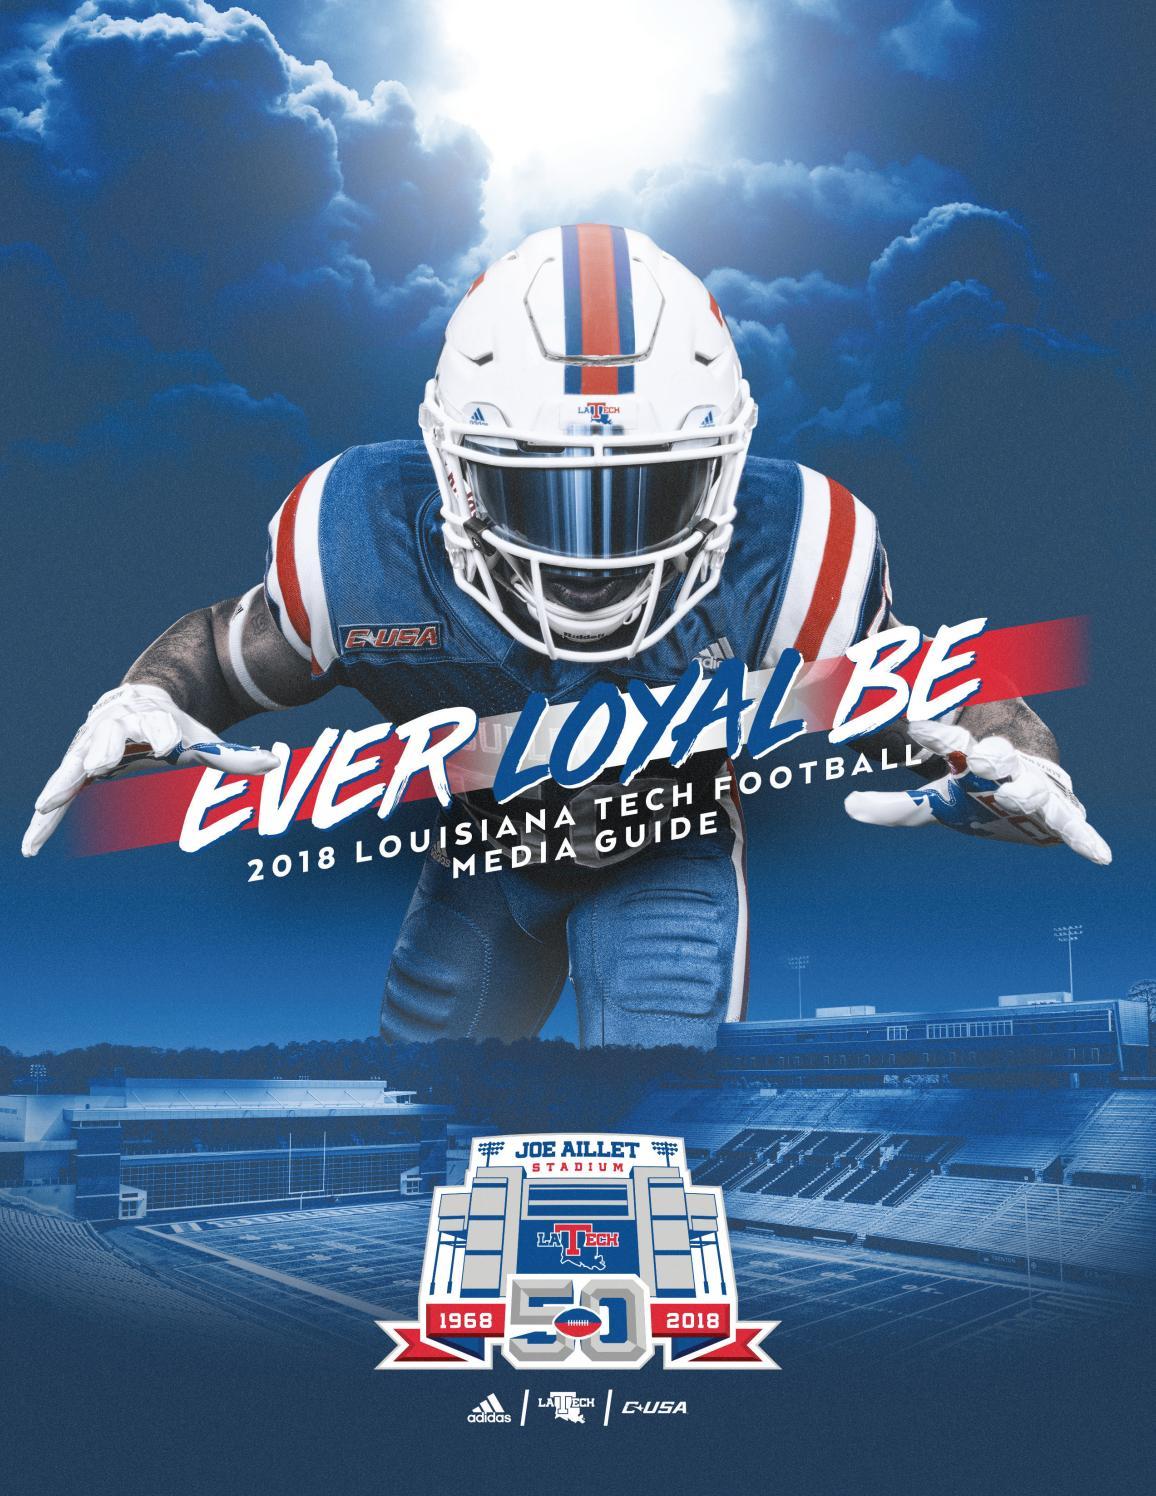 2018 Louisiana Tech Football Media Guide by Louisiana Tech